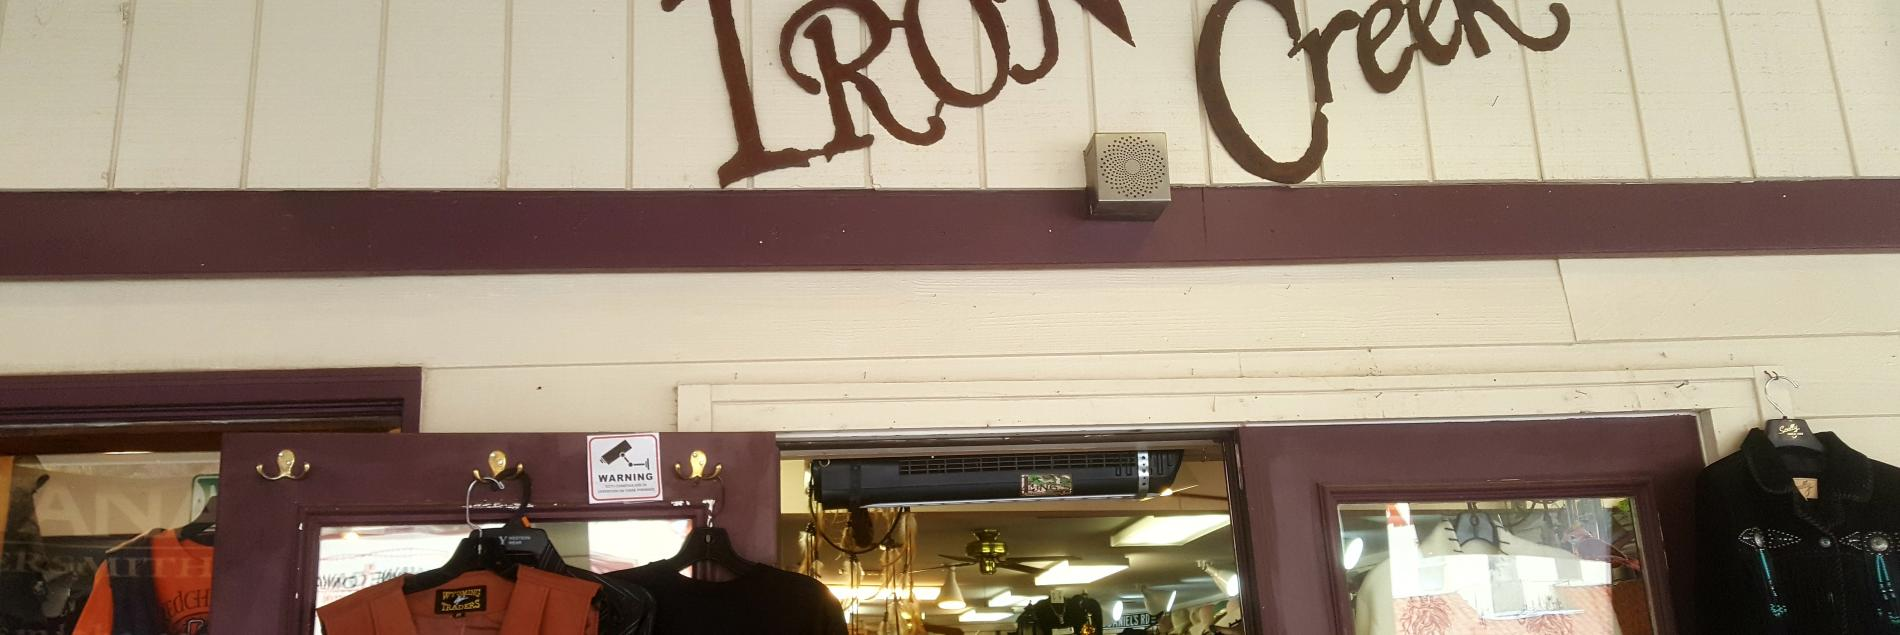 Iron Creek Leathers